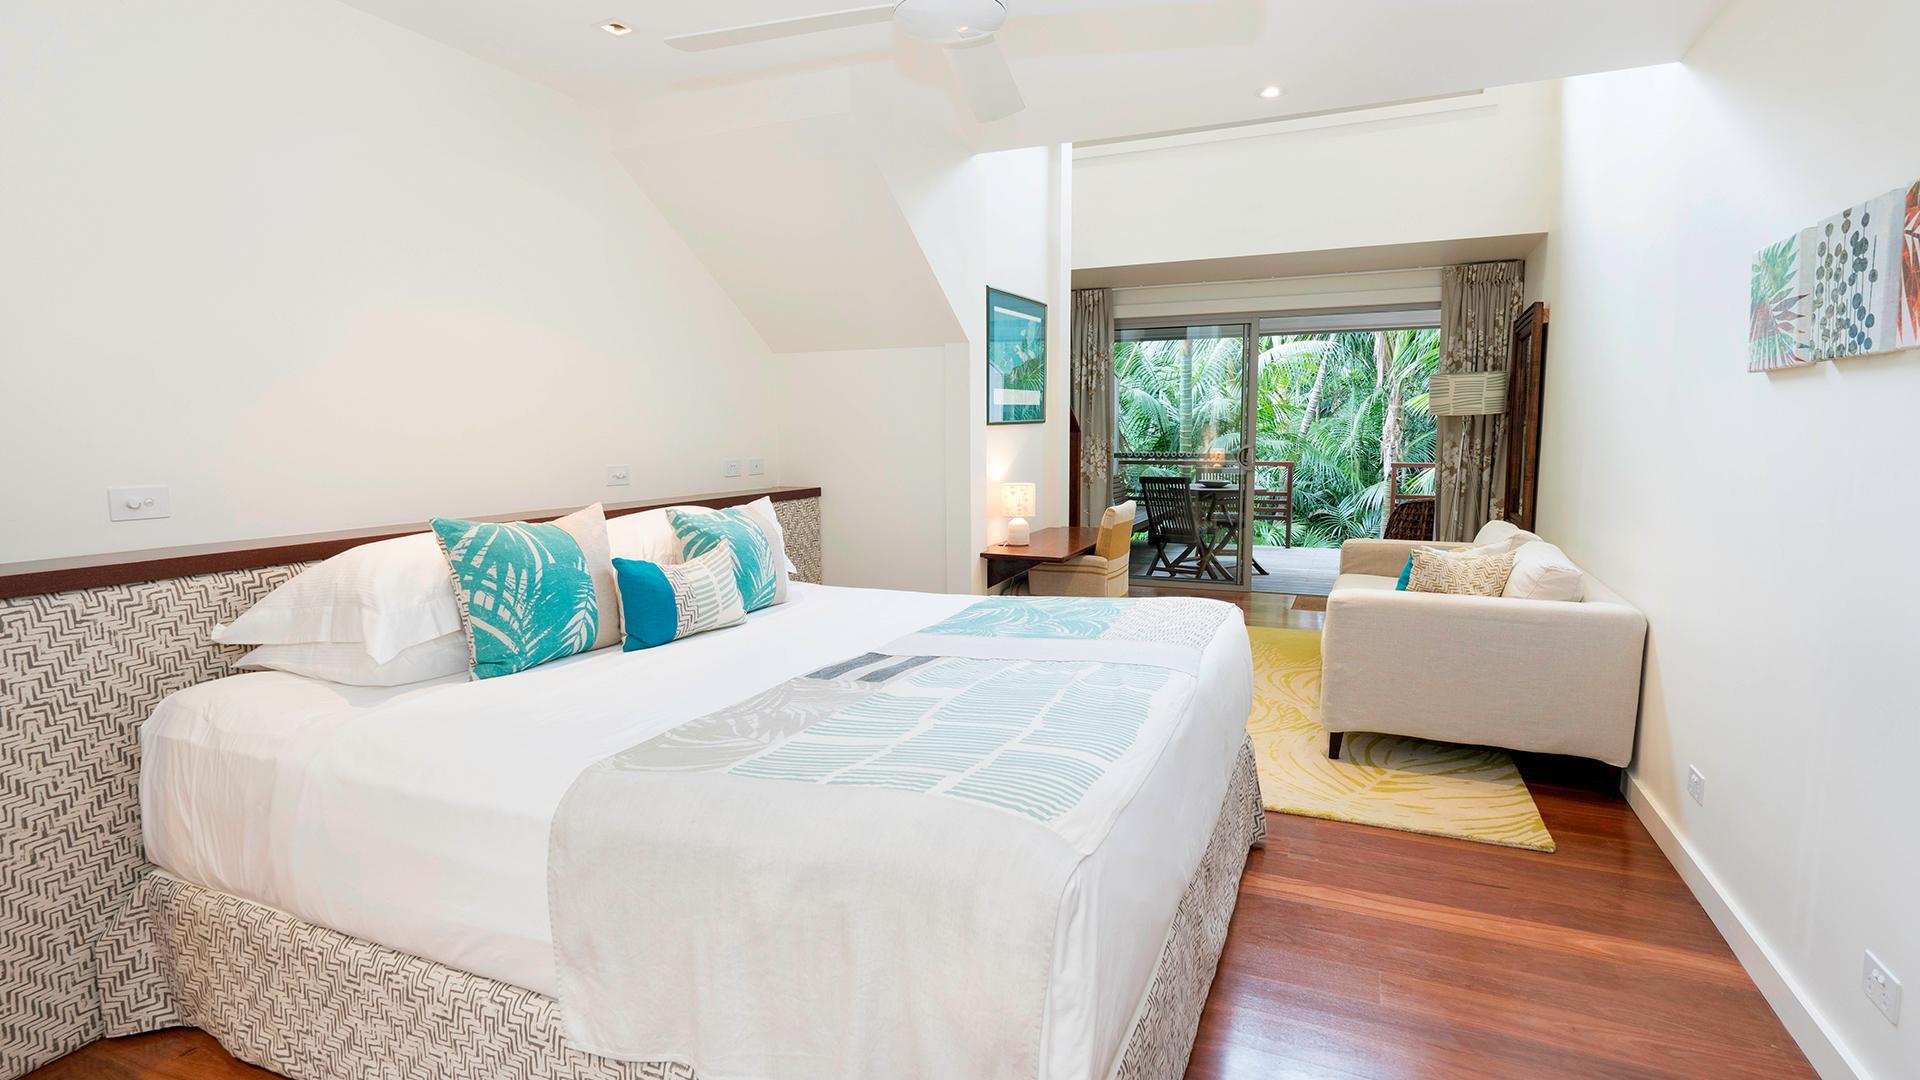 Banyan Suite image 1 at Arajilla Retreat by , New South Wales, Australia